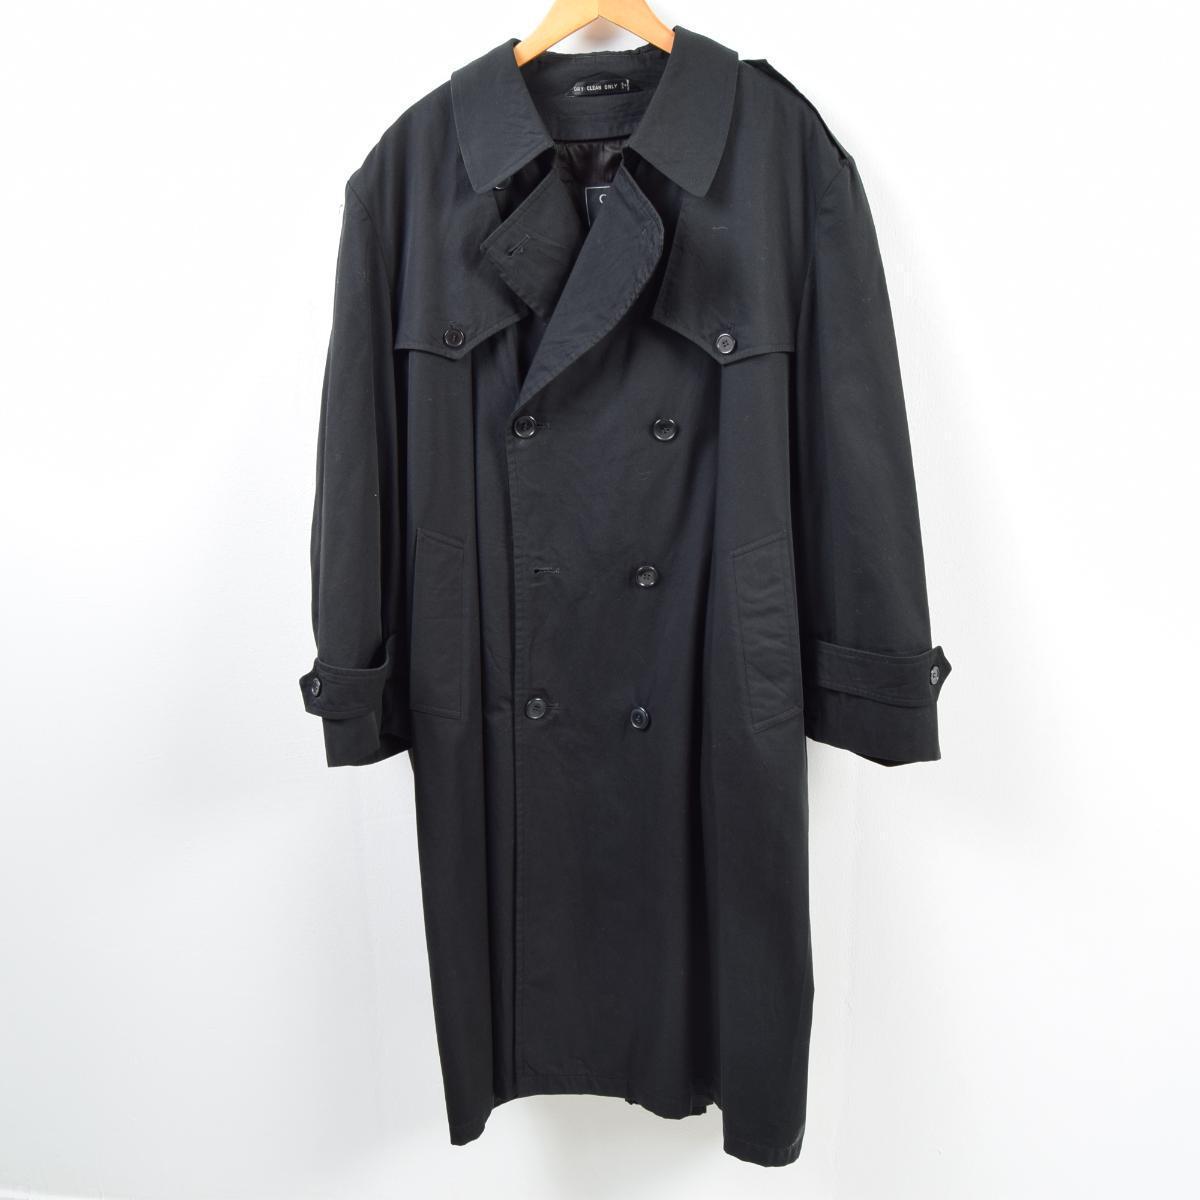 premium selection 6e80c 22b02 クリスチャンディオール Christian Dior MONSIEUR トレンチコート 46R メンズXL /wbc9816 【190222】